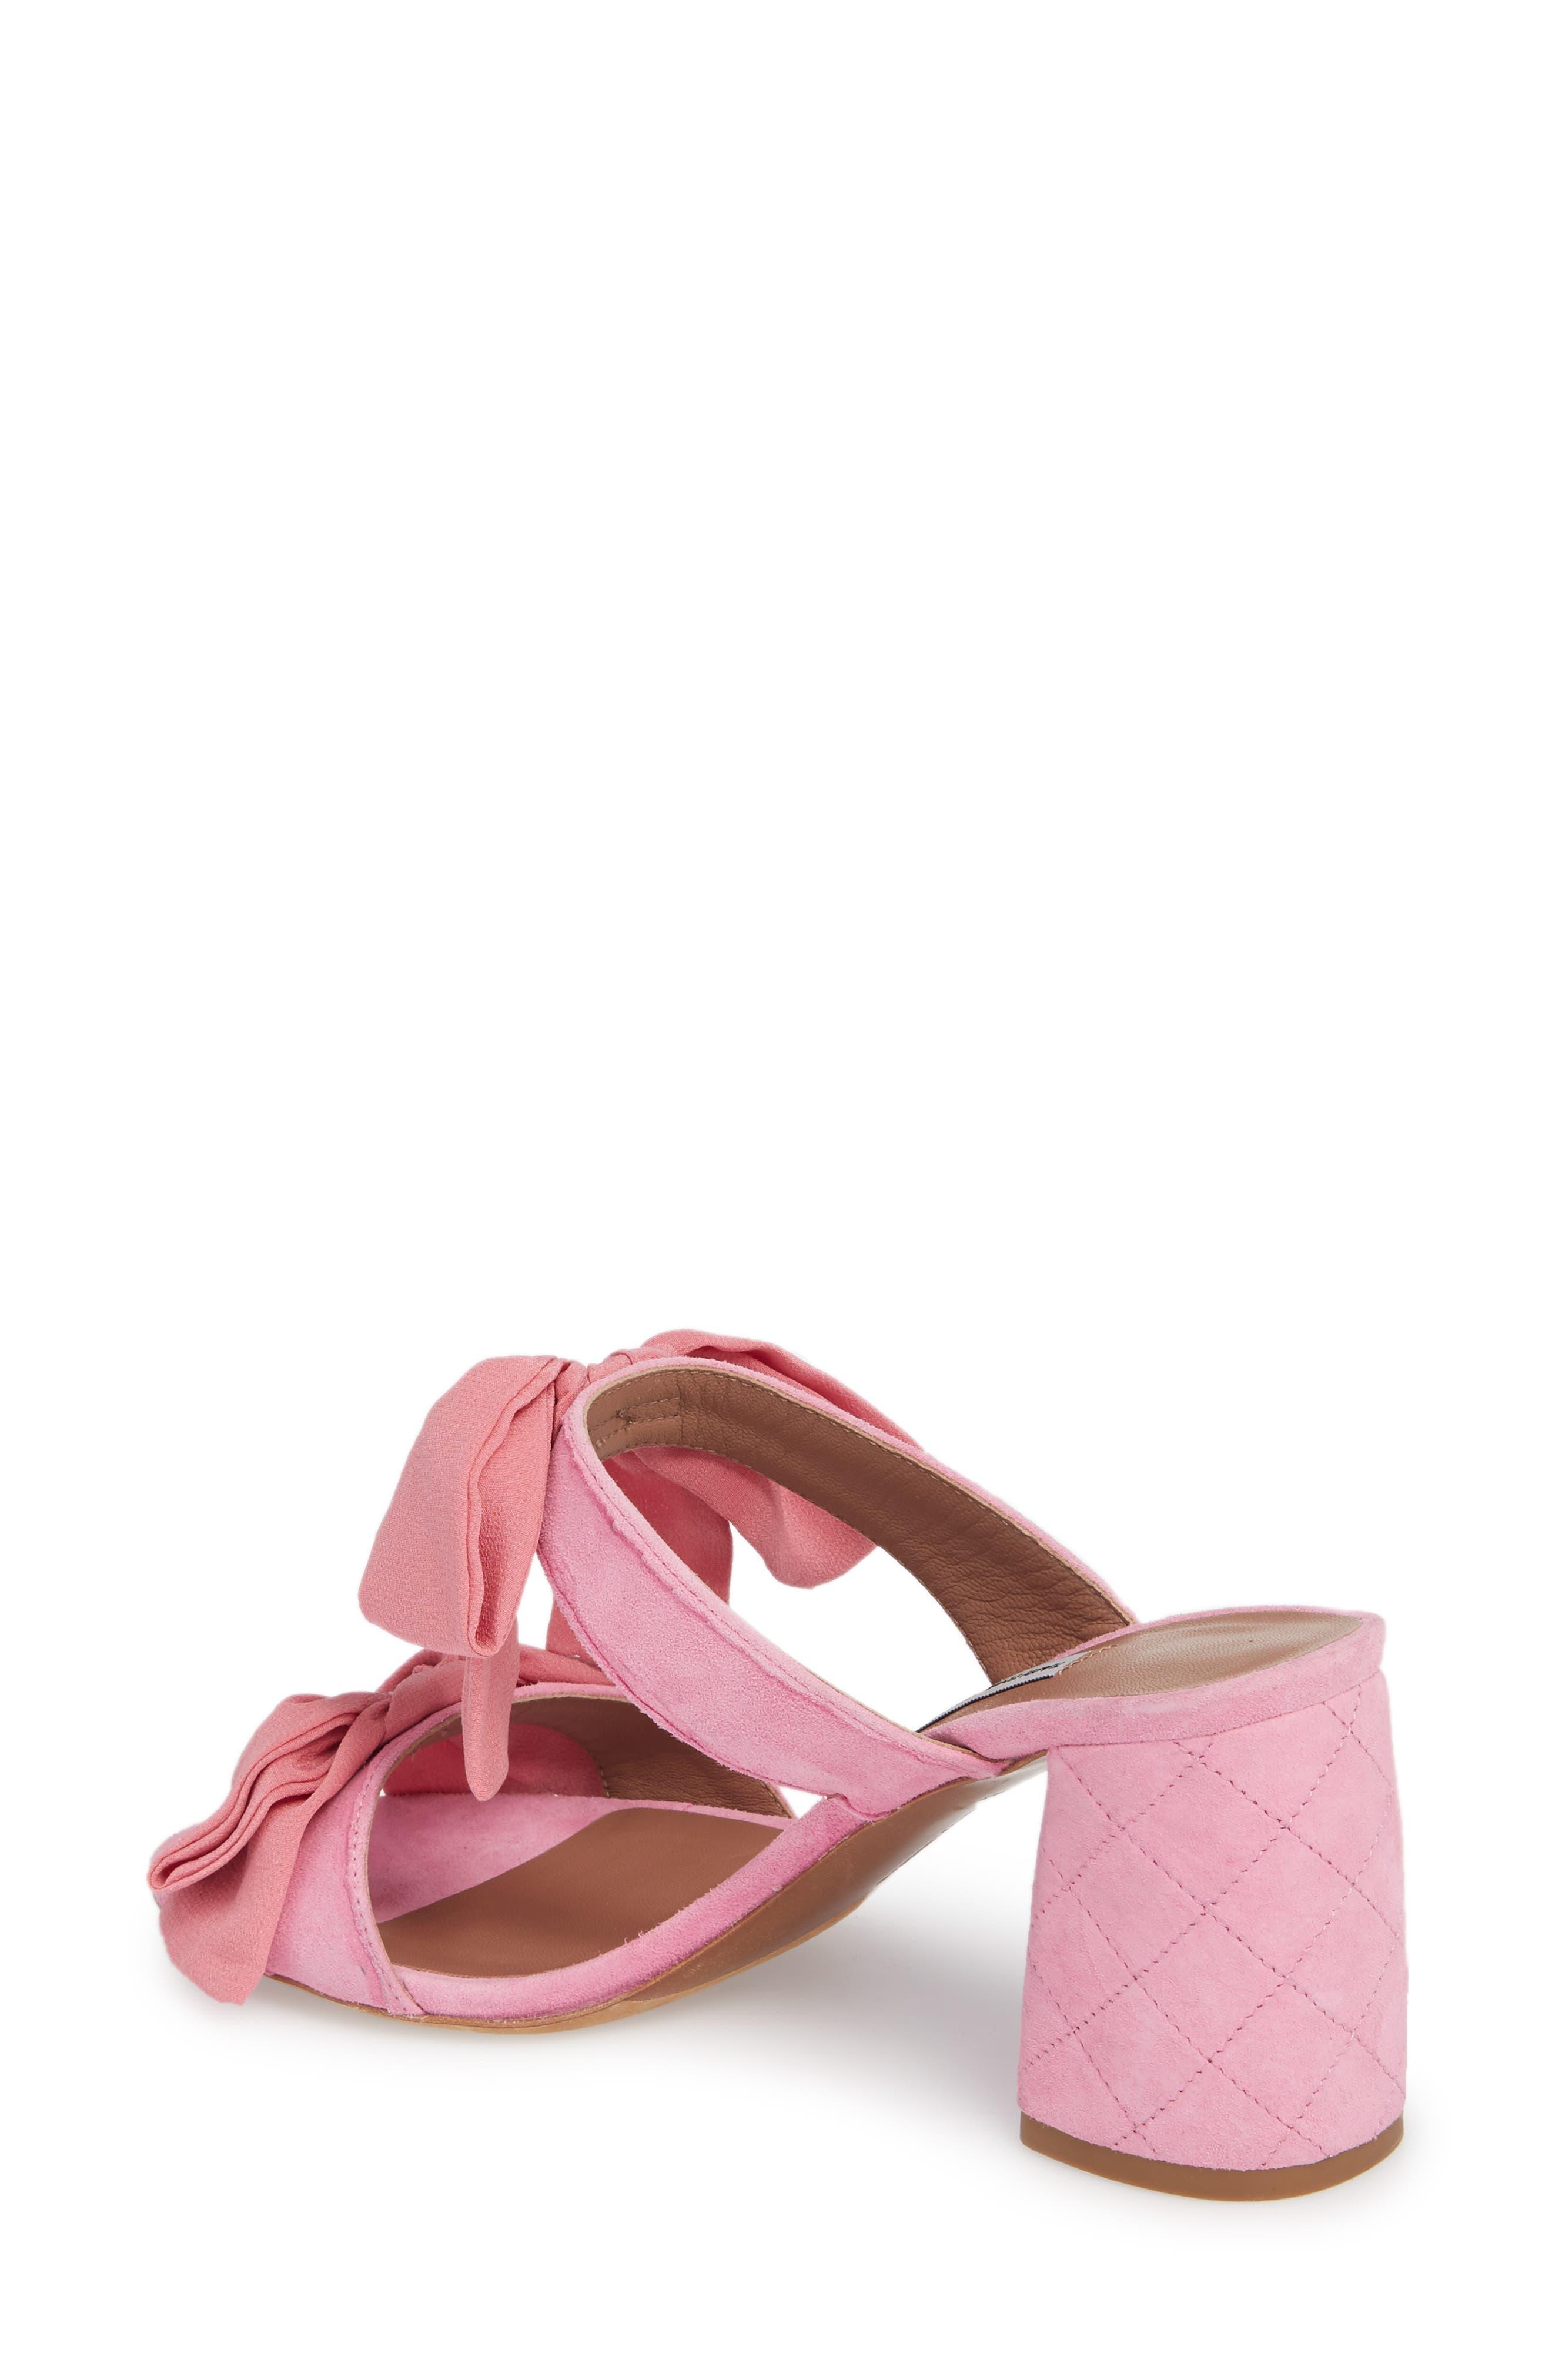 Barbi Bow Sandal,                             Alternate thumbnail 4, color,